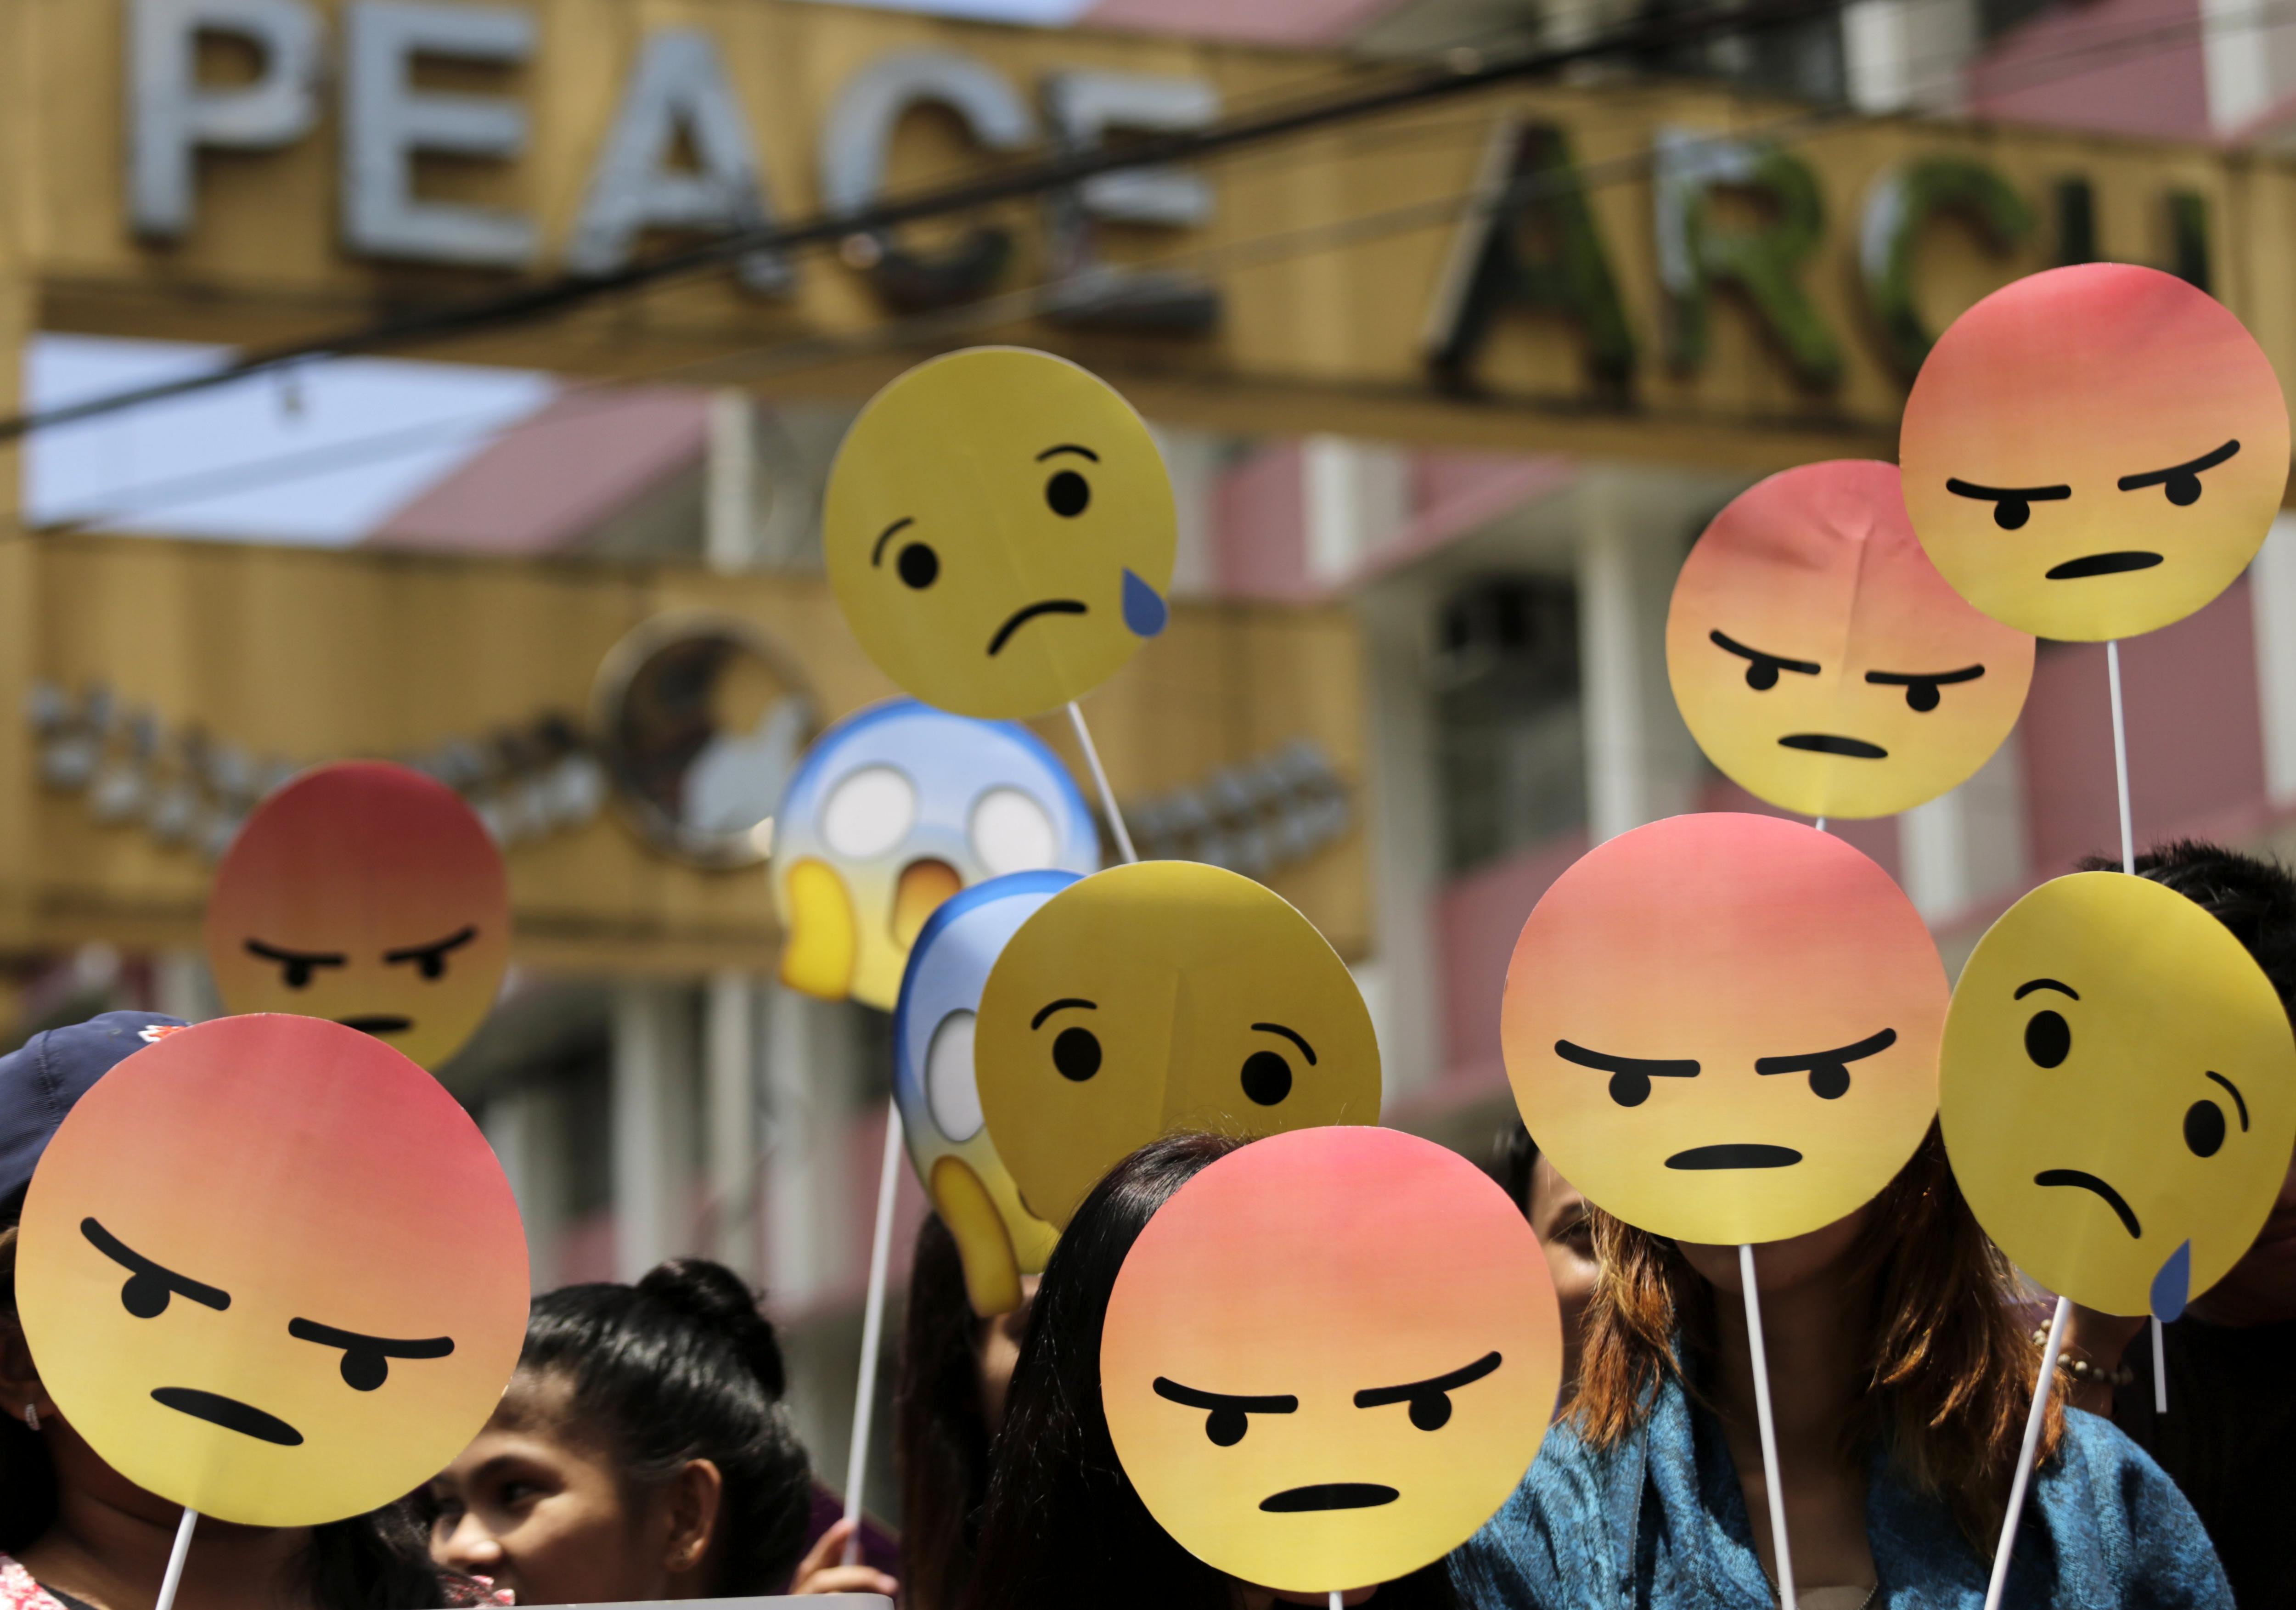 Manifestants protesten en contra del president filipí Rodrigo Duterte a les portes del Palau Presidencial a Manila (Filipines). /FRANCIS R. MALASIG